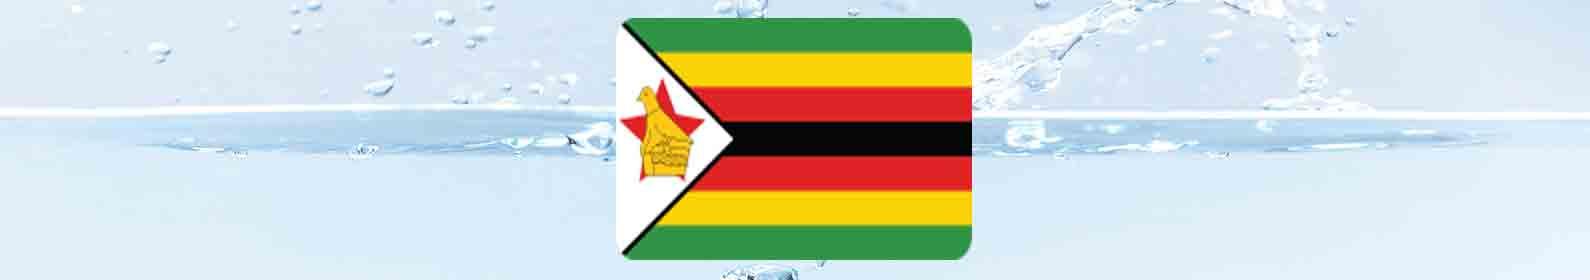 tratamento-de-agua-zimbabwe.jpg